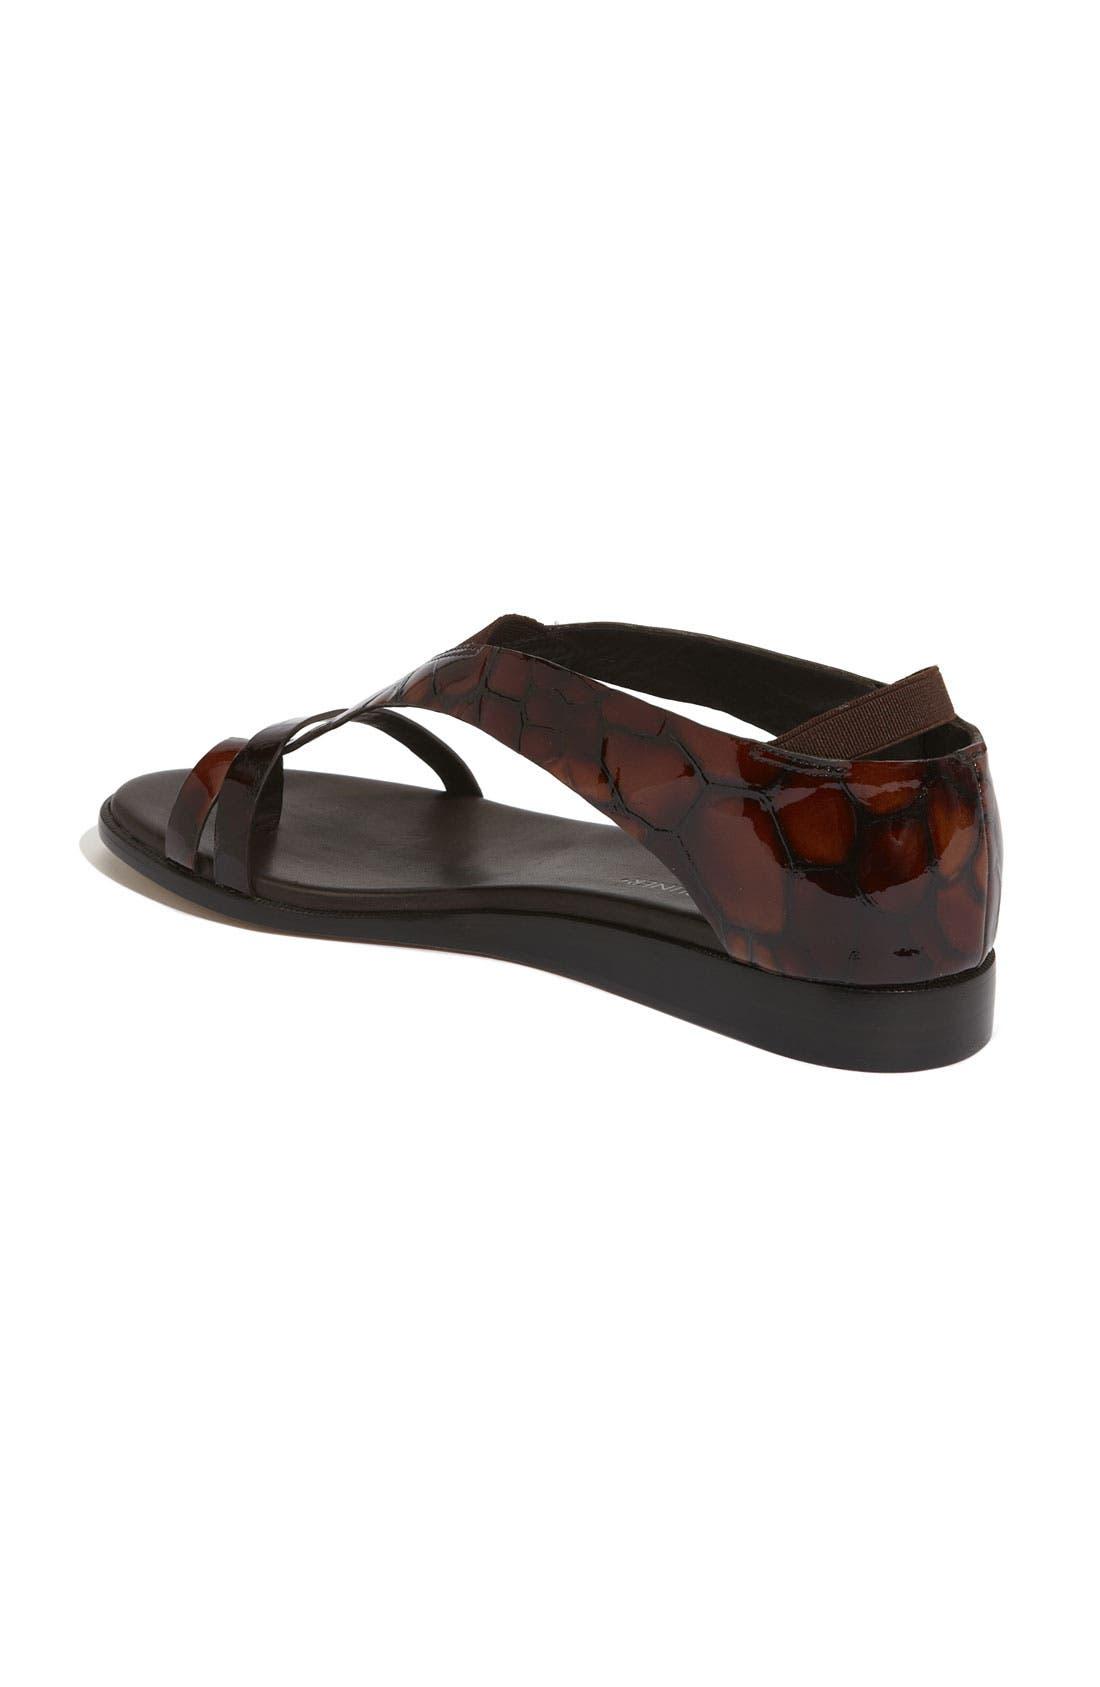 Alternate Image 2  - Donald J Pliner 'Dorcas' Sandal